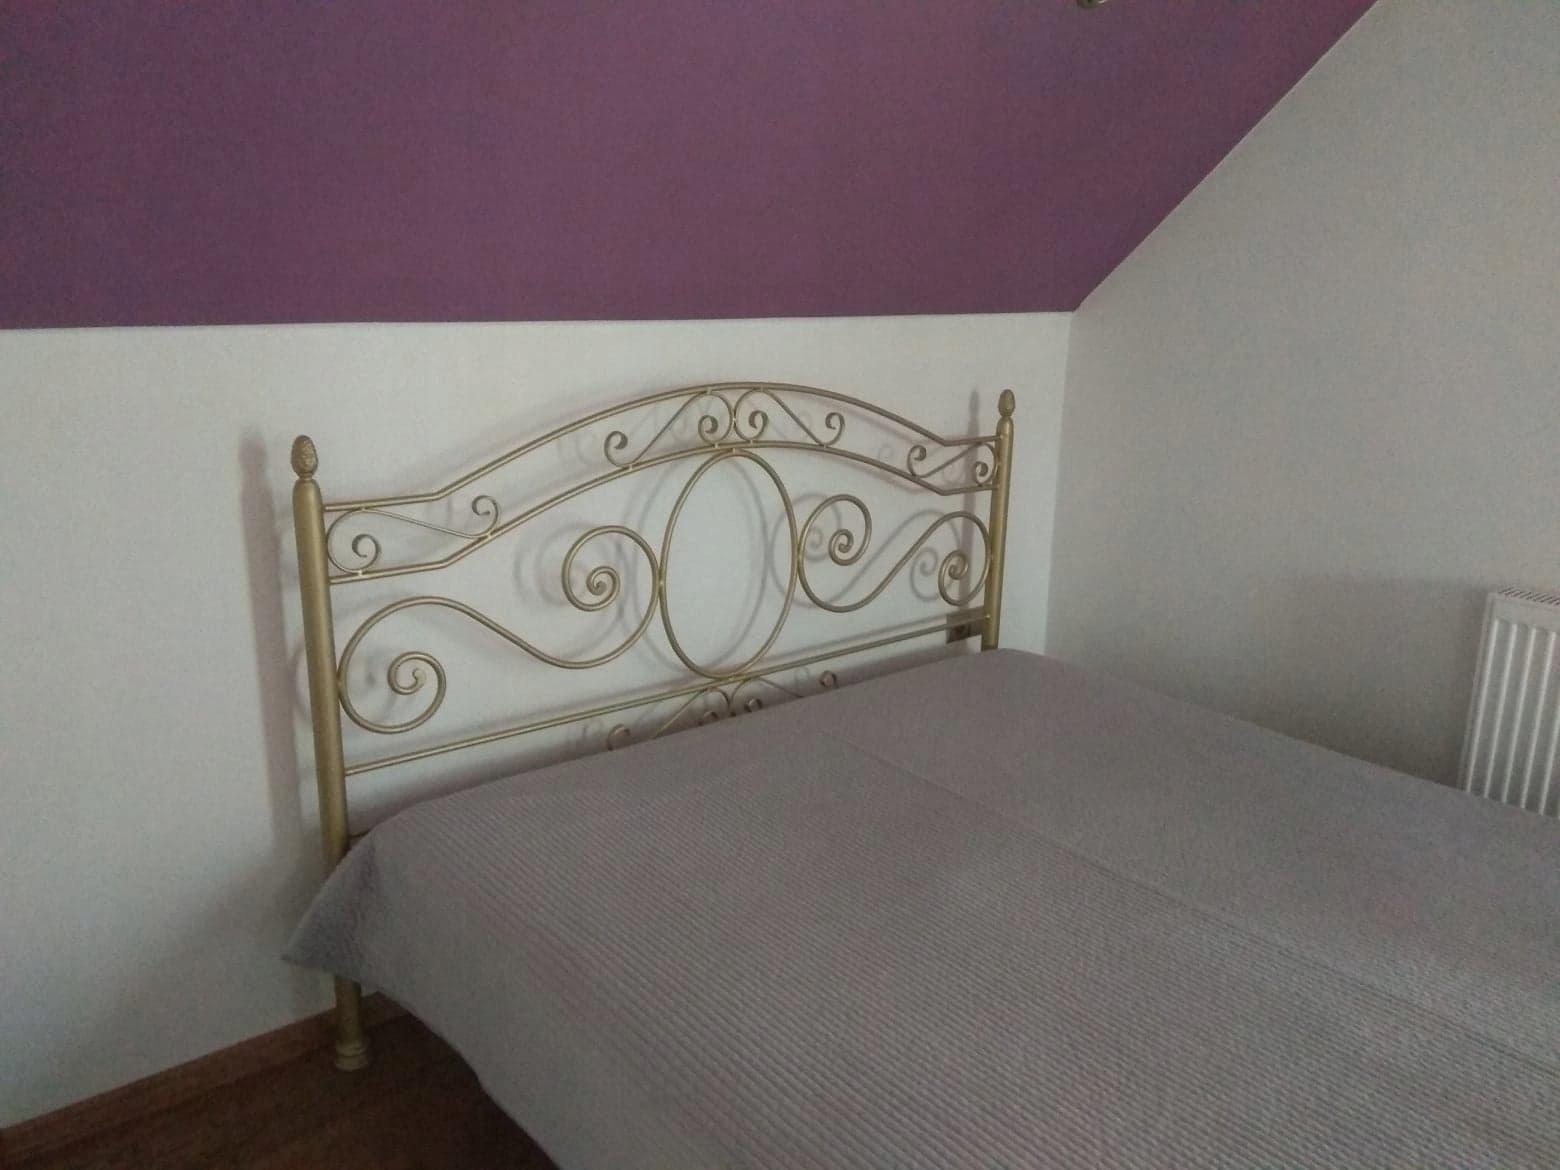 łóżko Metalowe Kute 160200 Podwójnestelaż Krosno